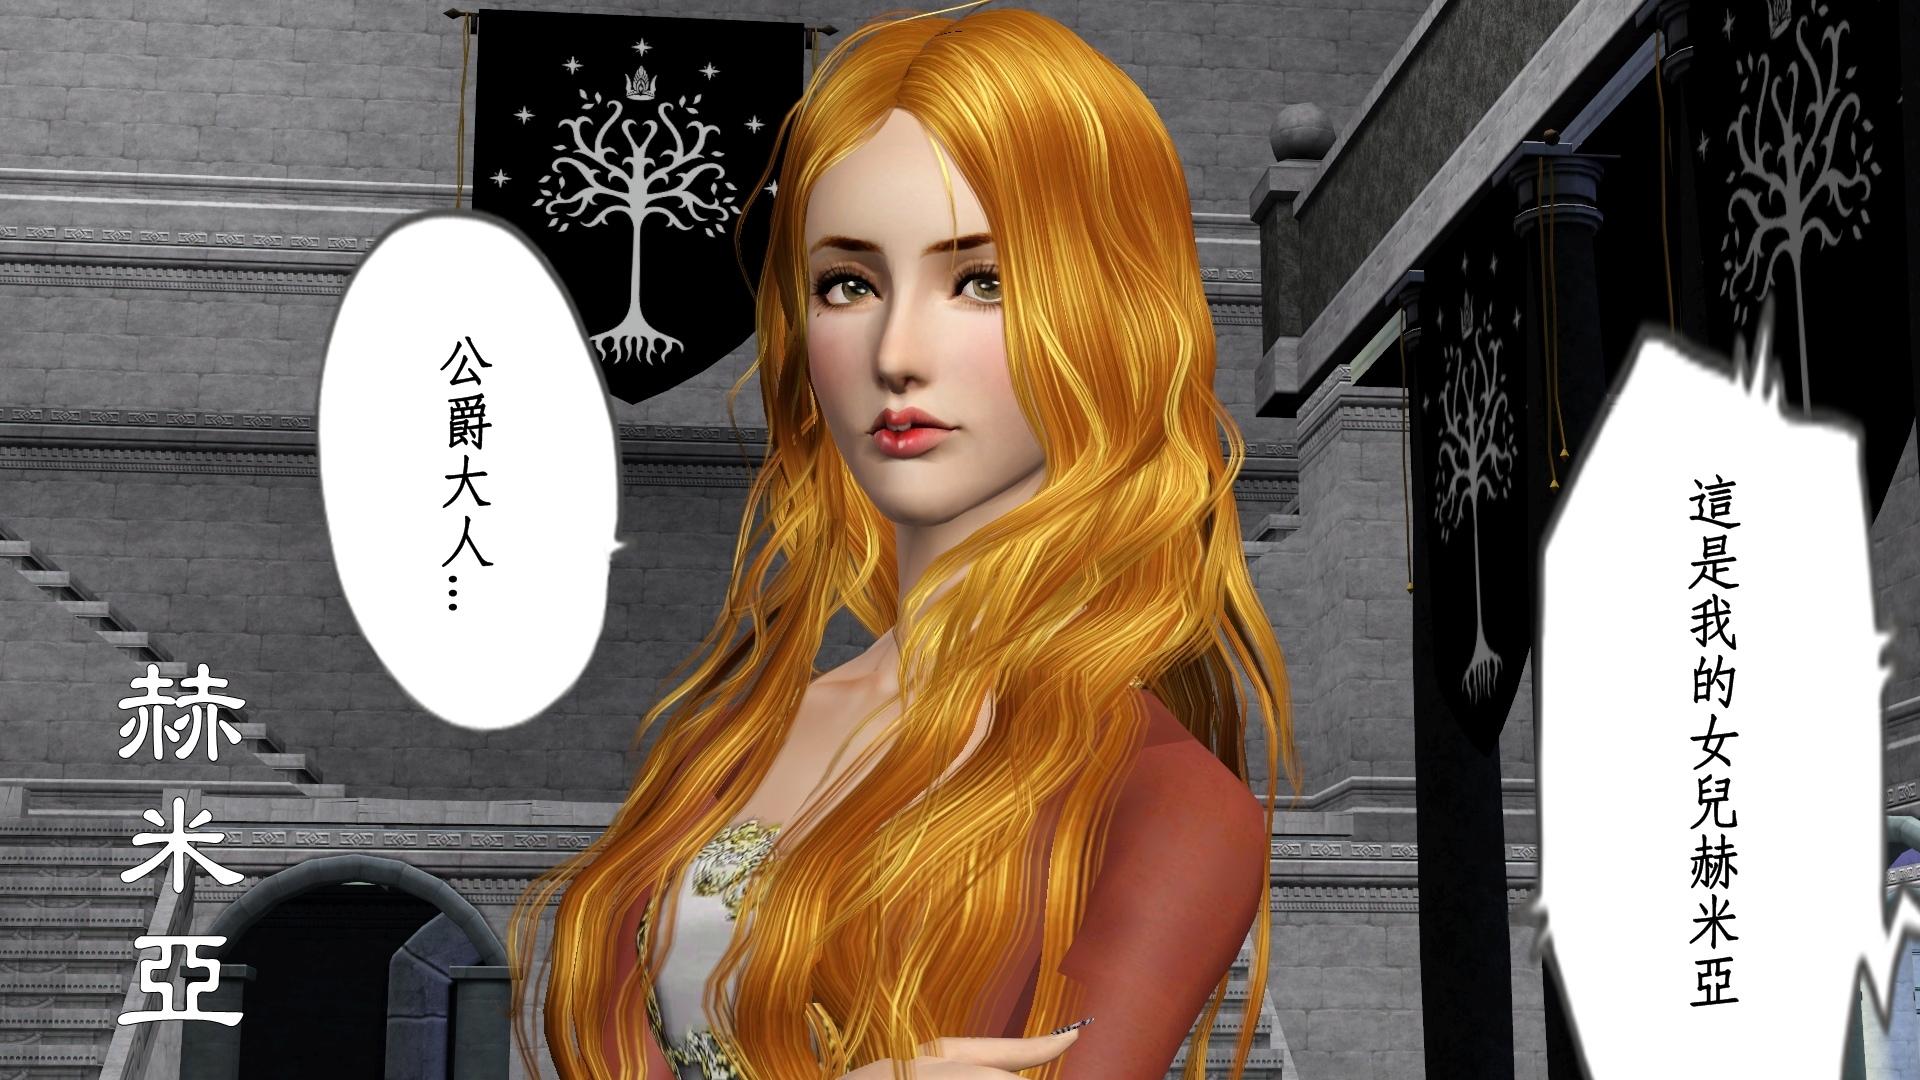 A04這是我女兒赫米婭 赫米亞(瑪蓮露飾).jpg